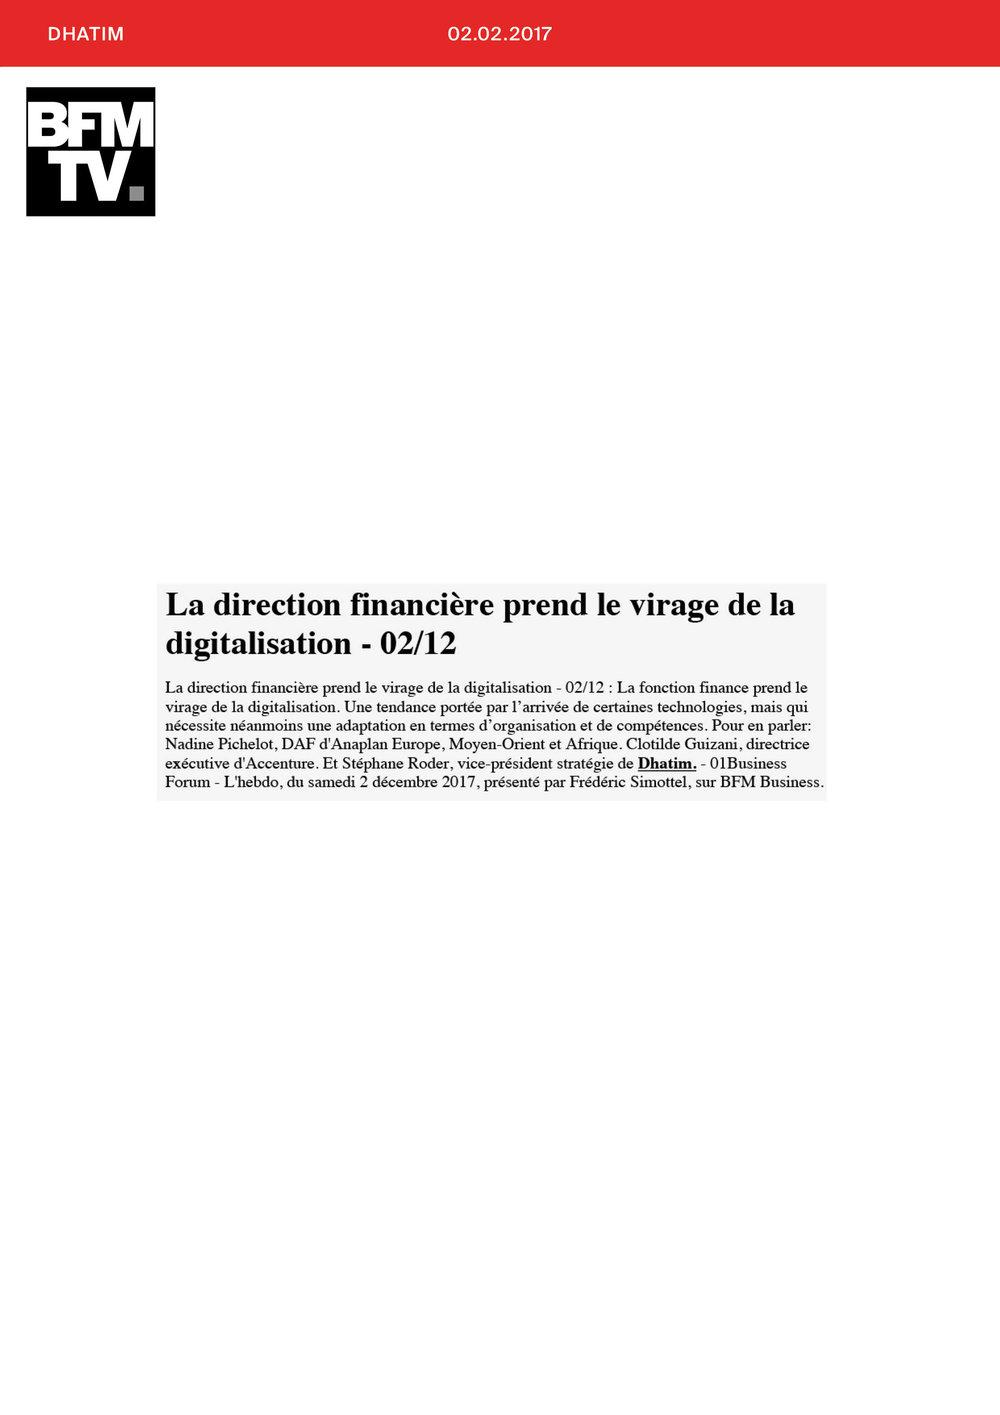 BOOKMEDIA_DEC3.jpg